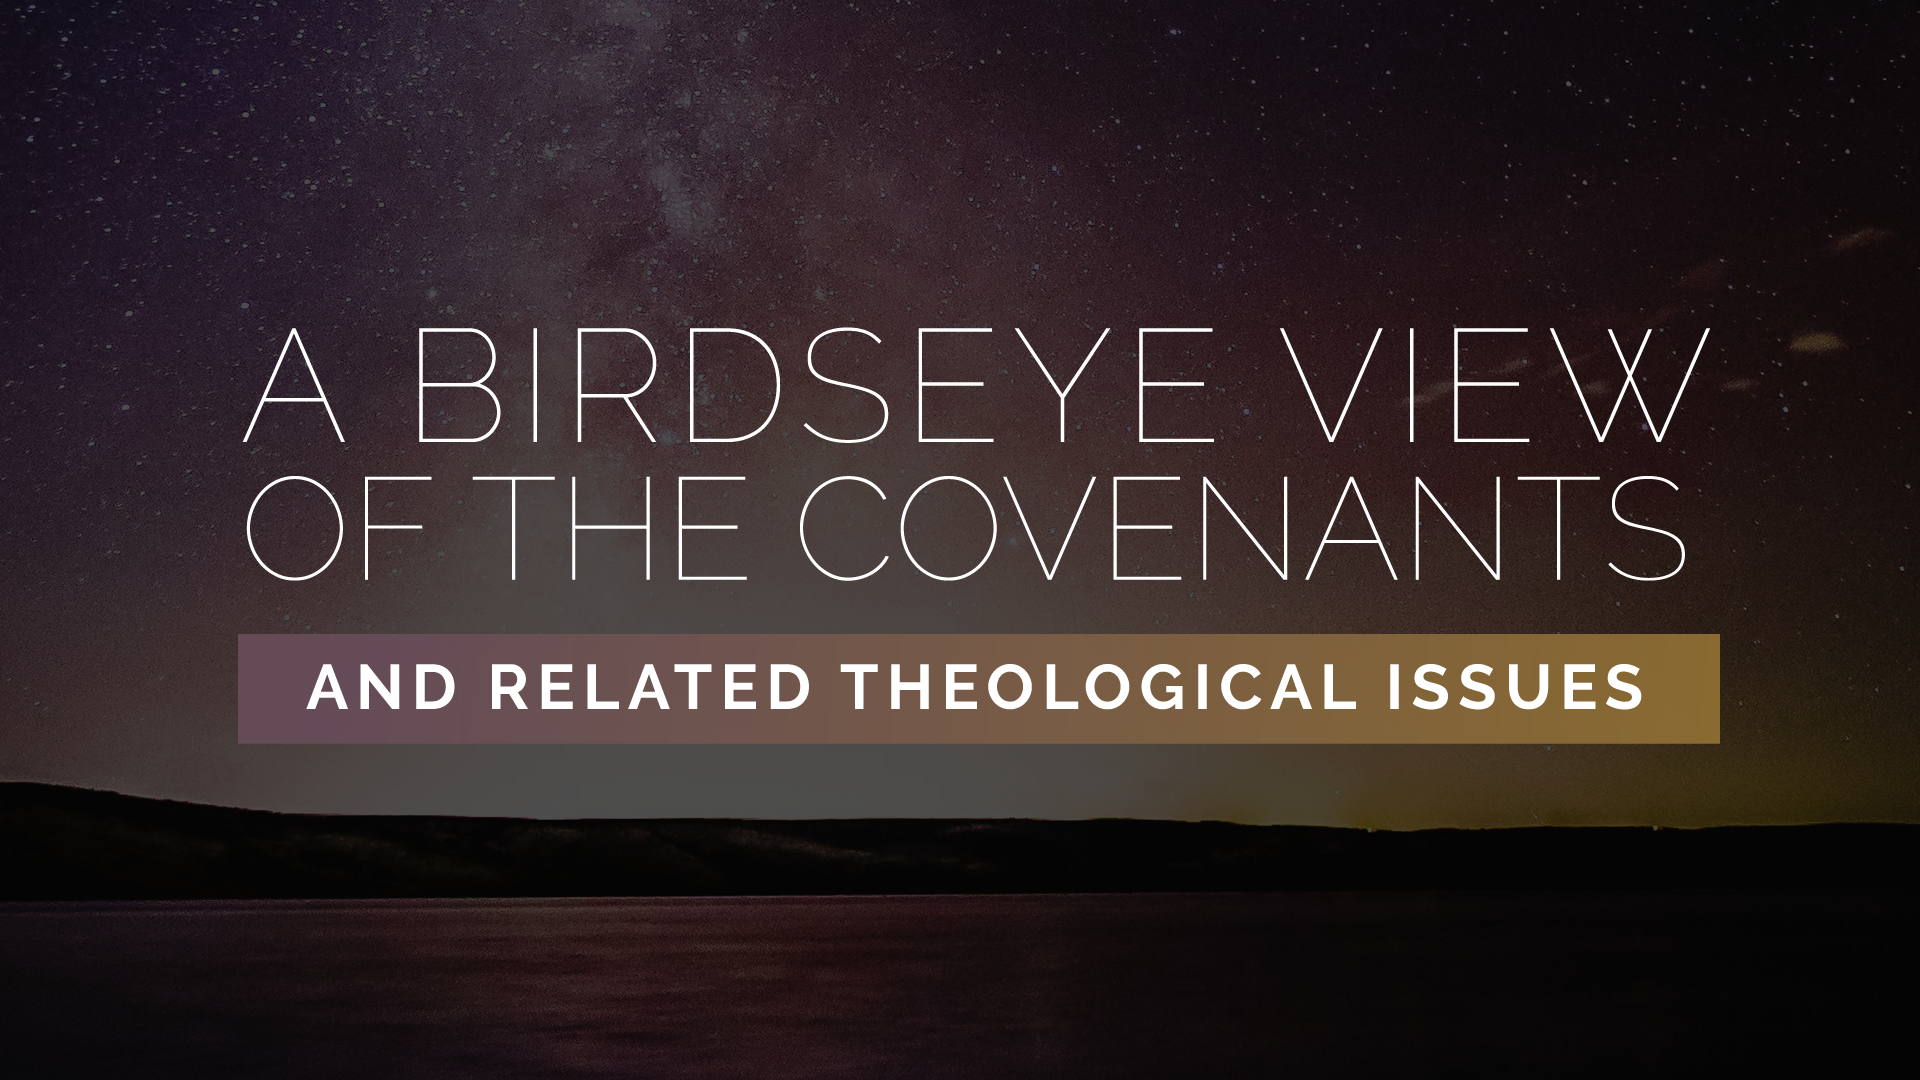 A Birdseye View of the Covenants.jpg